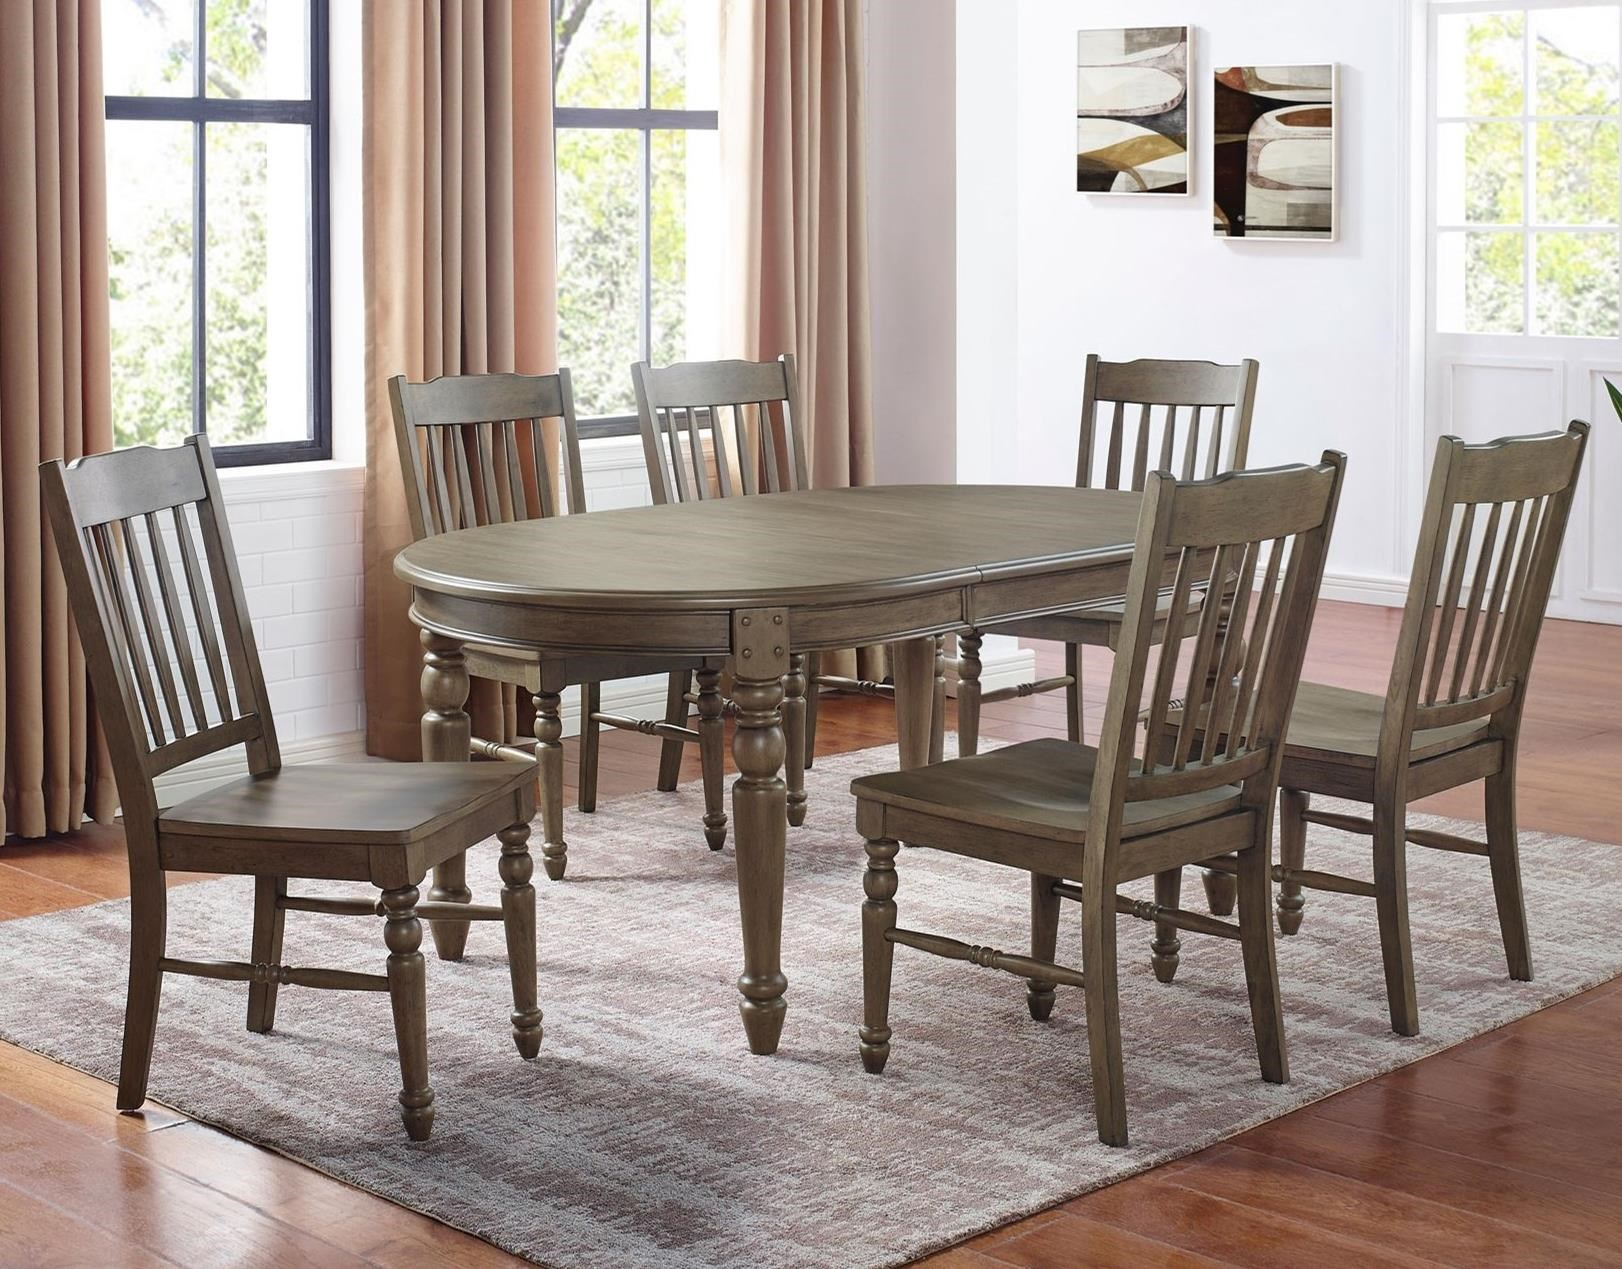 Emmett 7-Piece Table Set by Steve Silver at Walker's Furniture